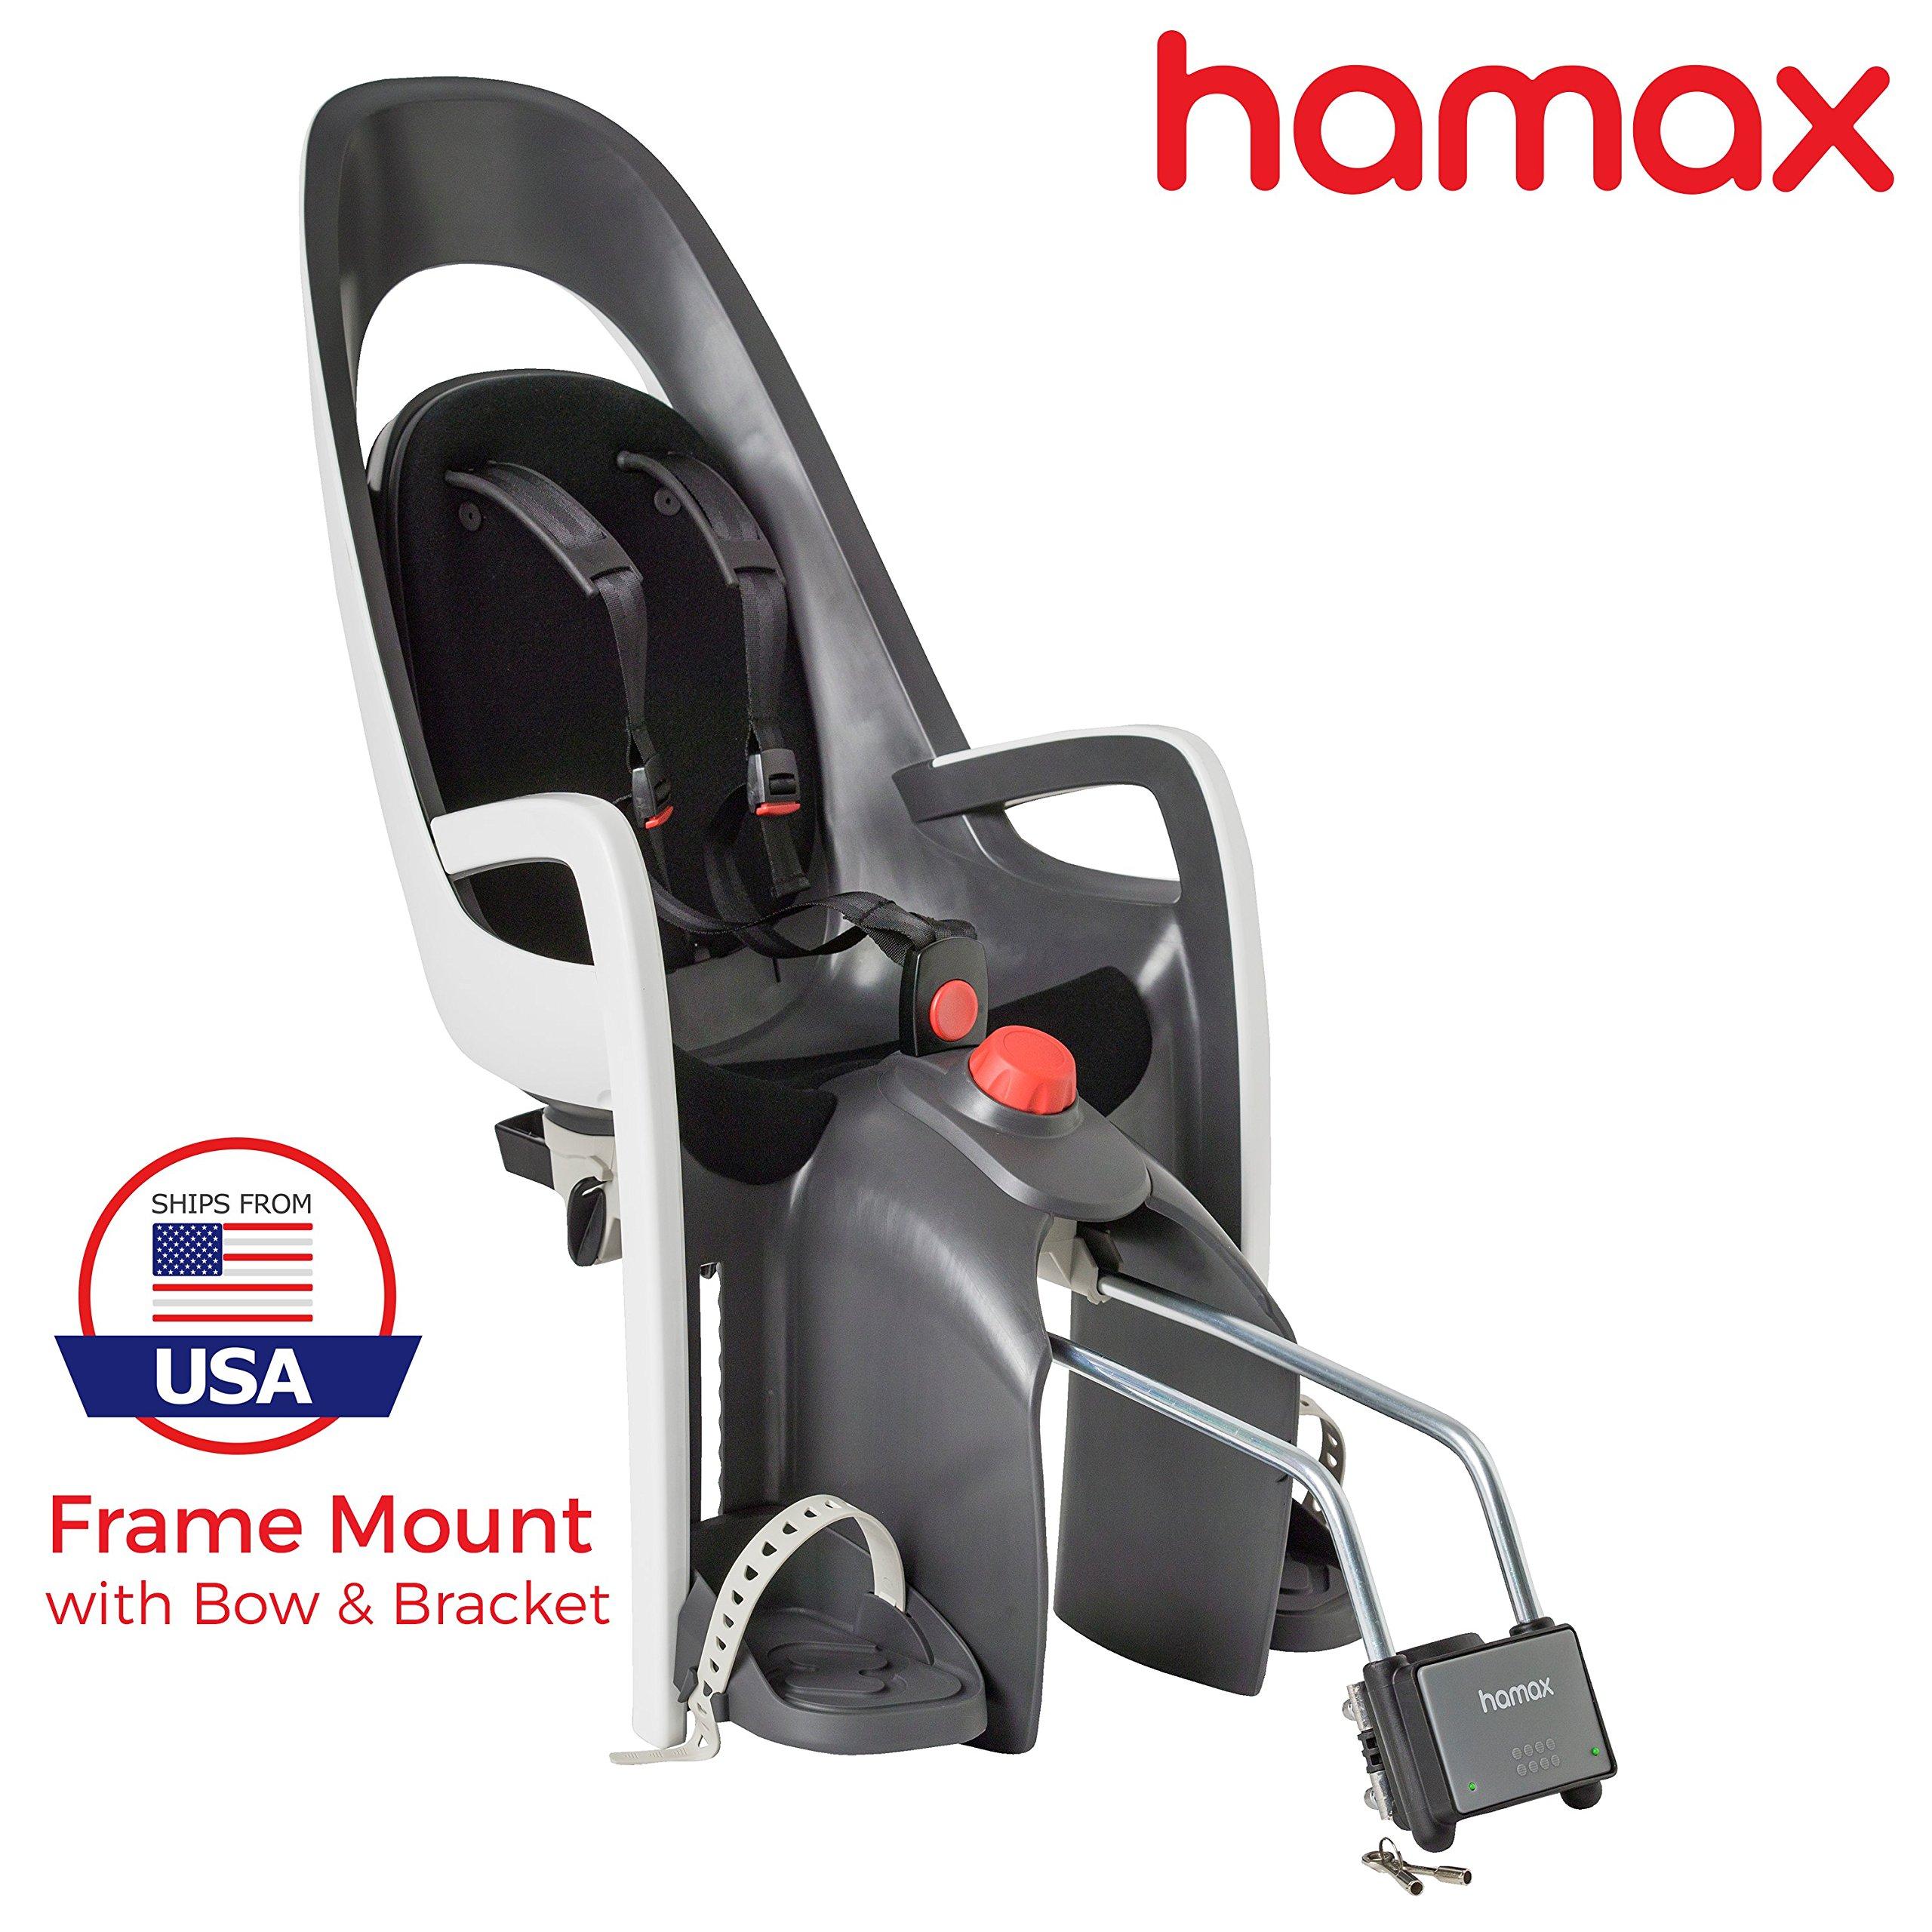 Hamax Caress Rear Child Bike Seat (Grey/White, Frame Mount) by Hamax (Image #1)